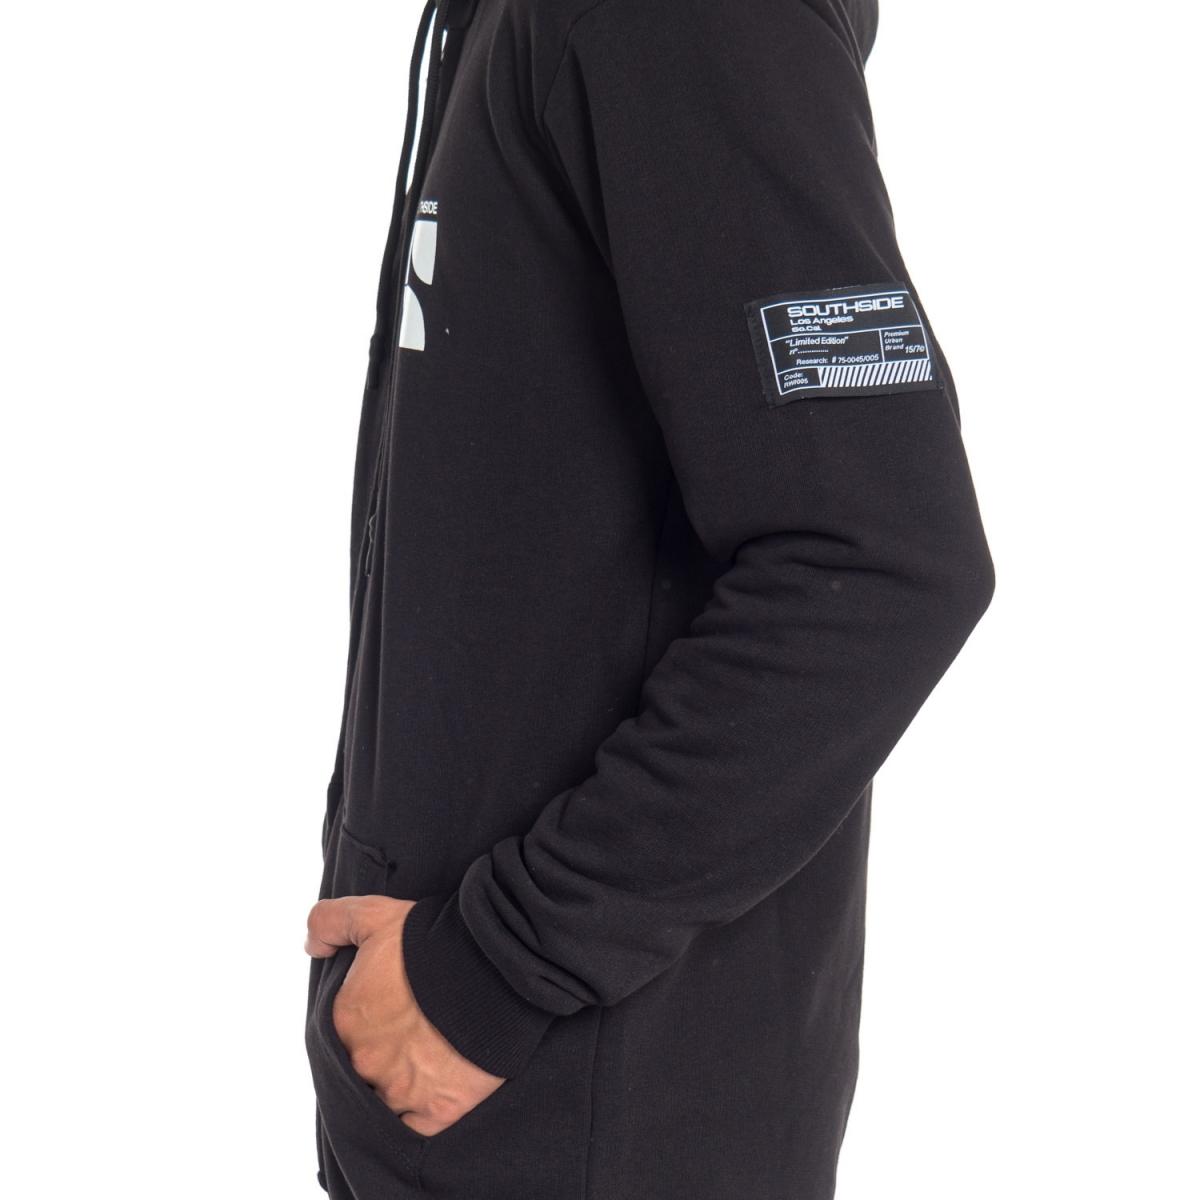 abbigliamento Felpe uomo Felpa con zip e cappuccio SX4-11ST SOUTHSIDE Cafedelmar Shop